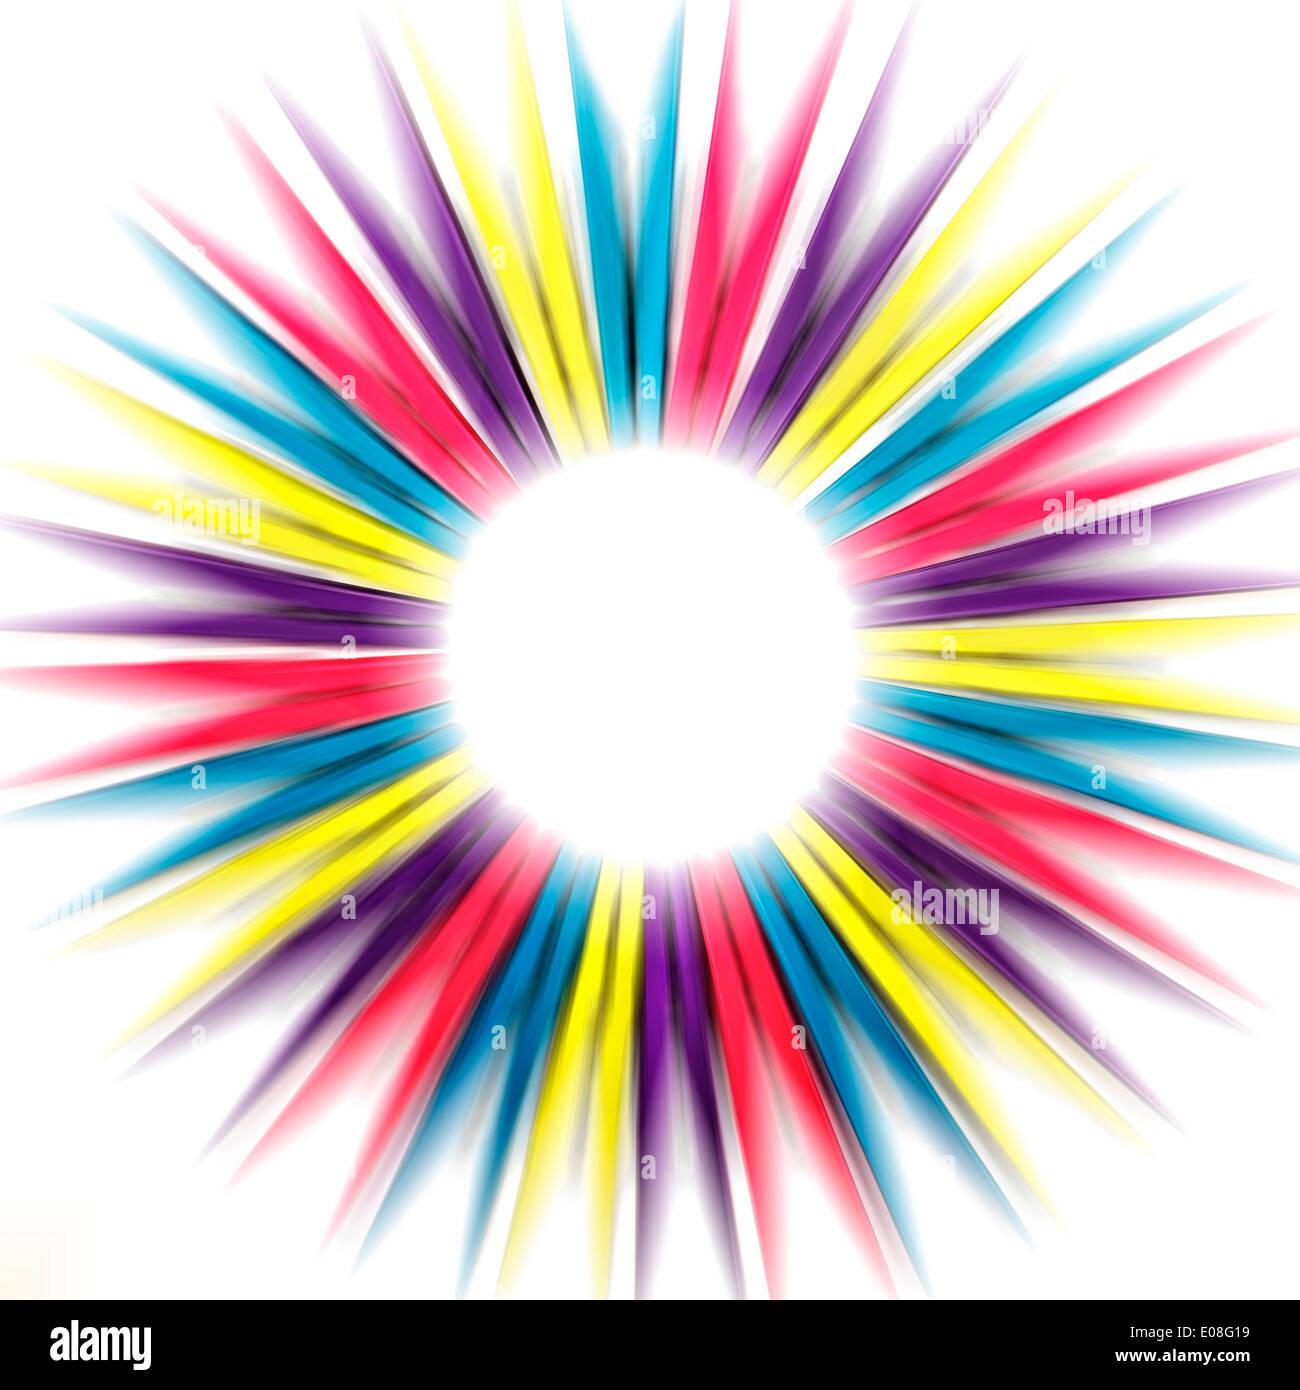 Abstract Rainbow Pegs - Stock Image